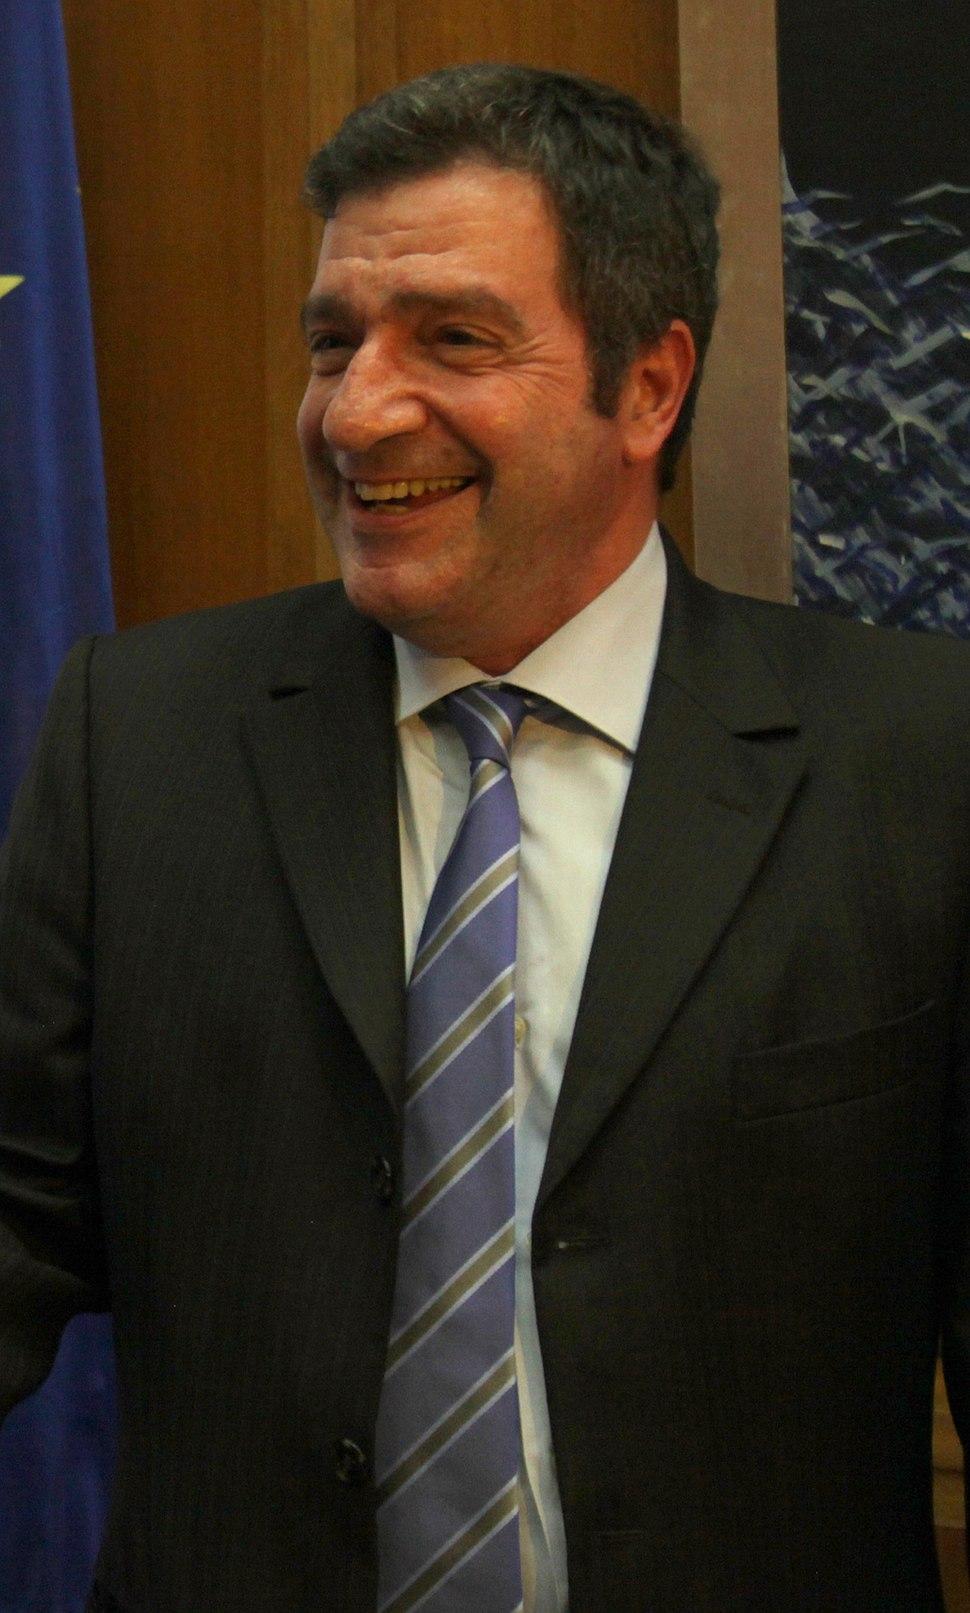 George Kaminis